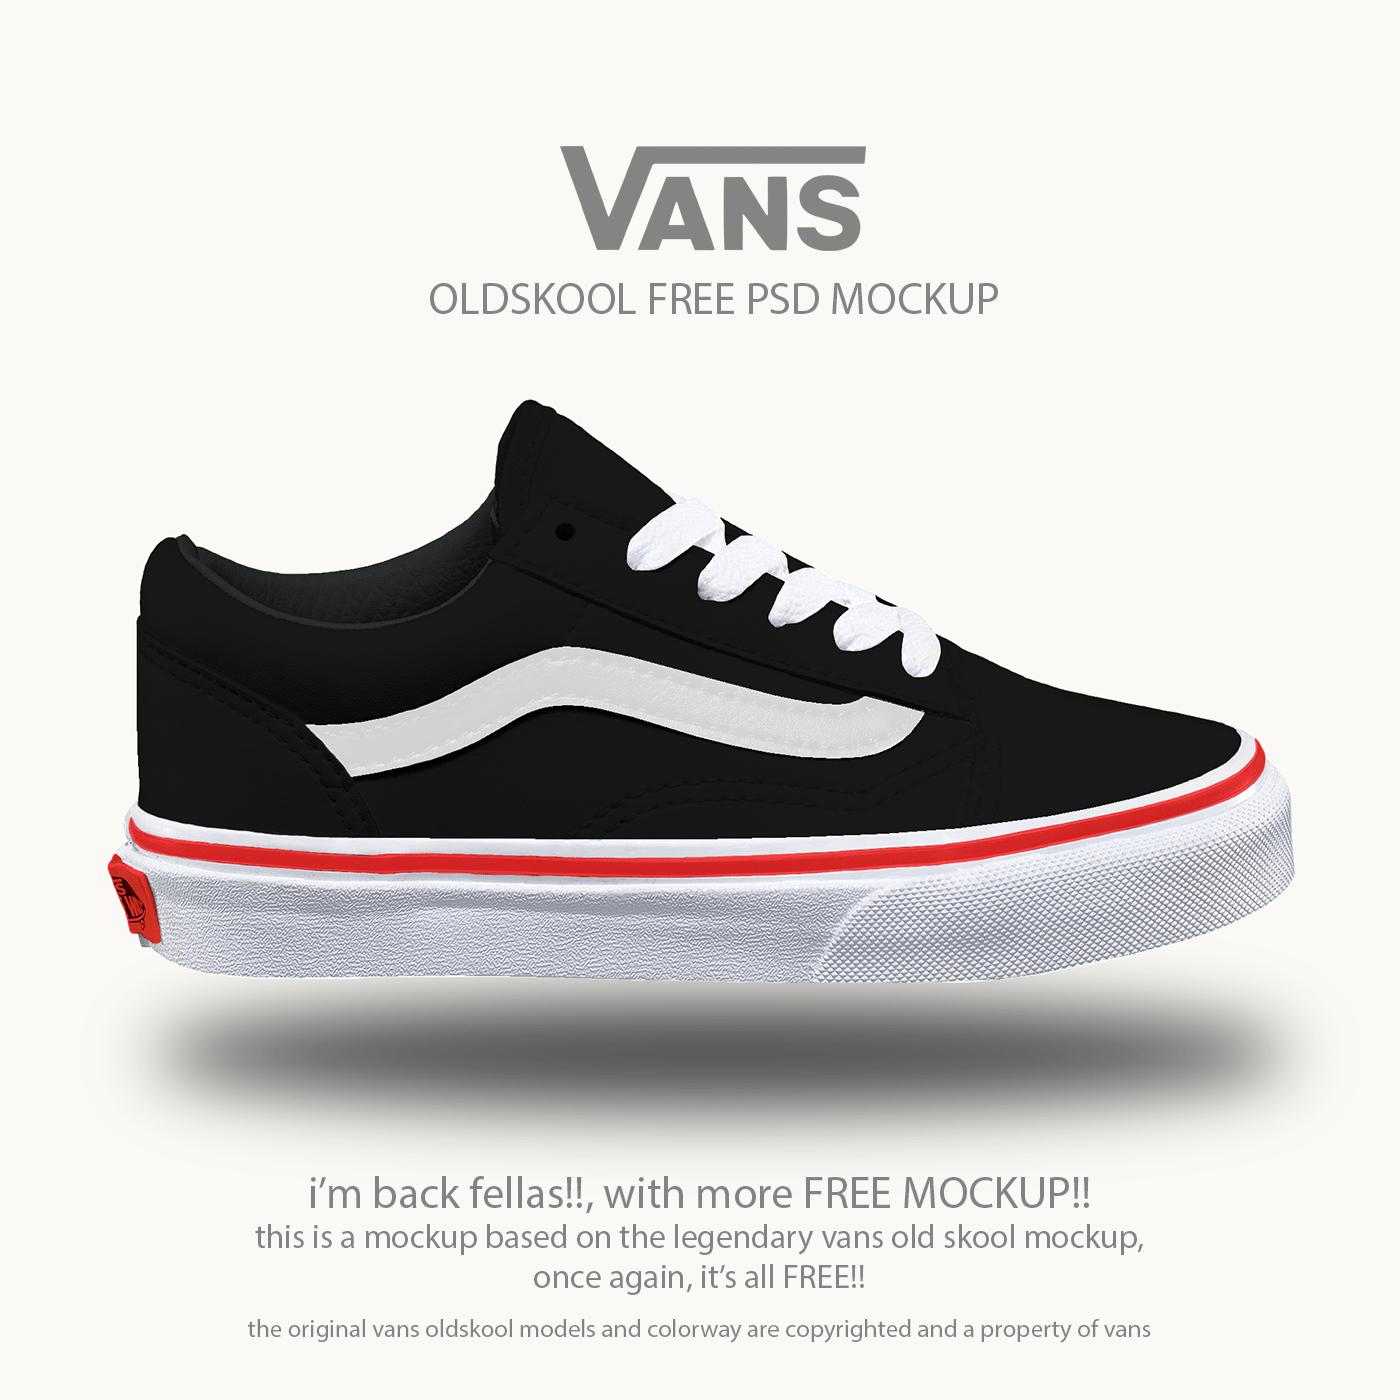 VANS™ Old School Shoes - Free PSD